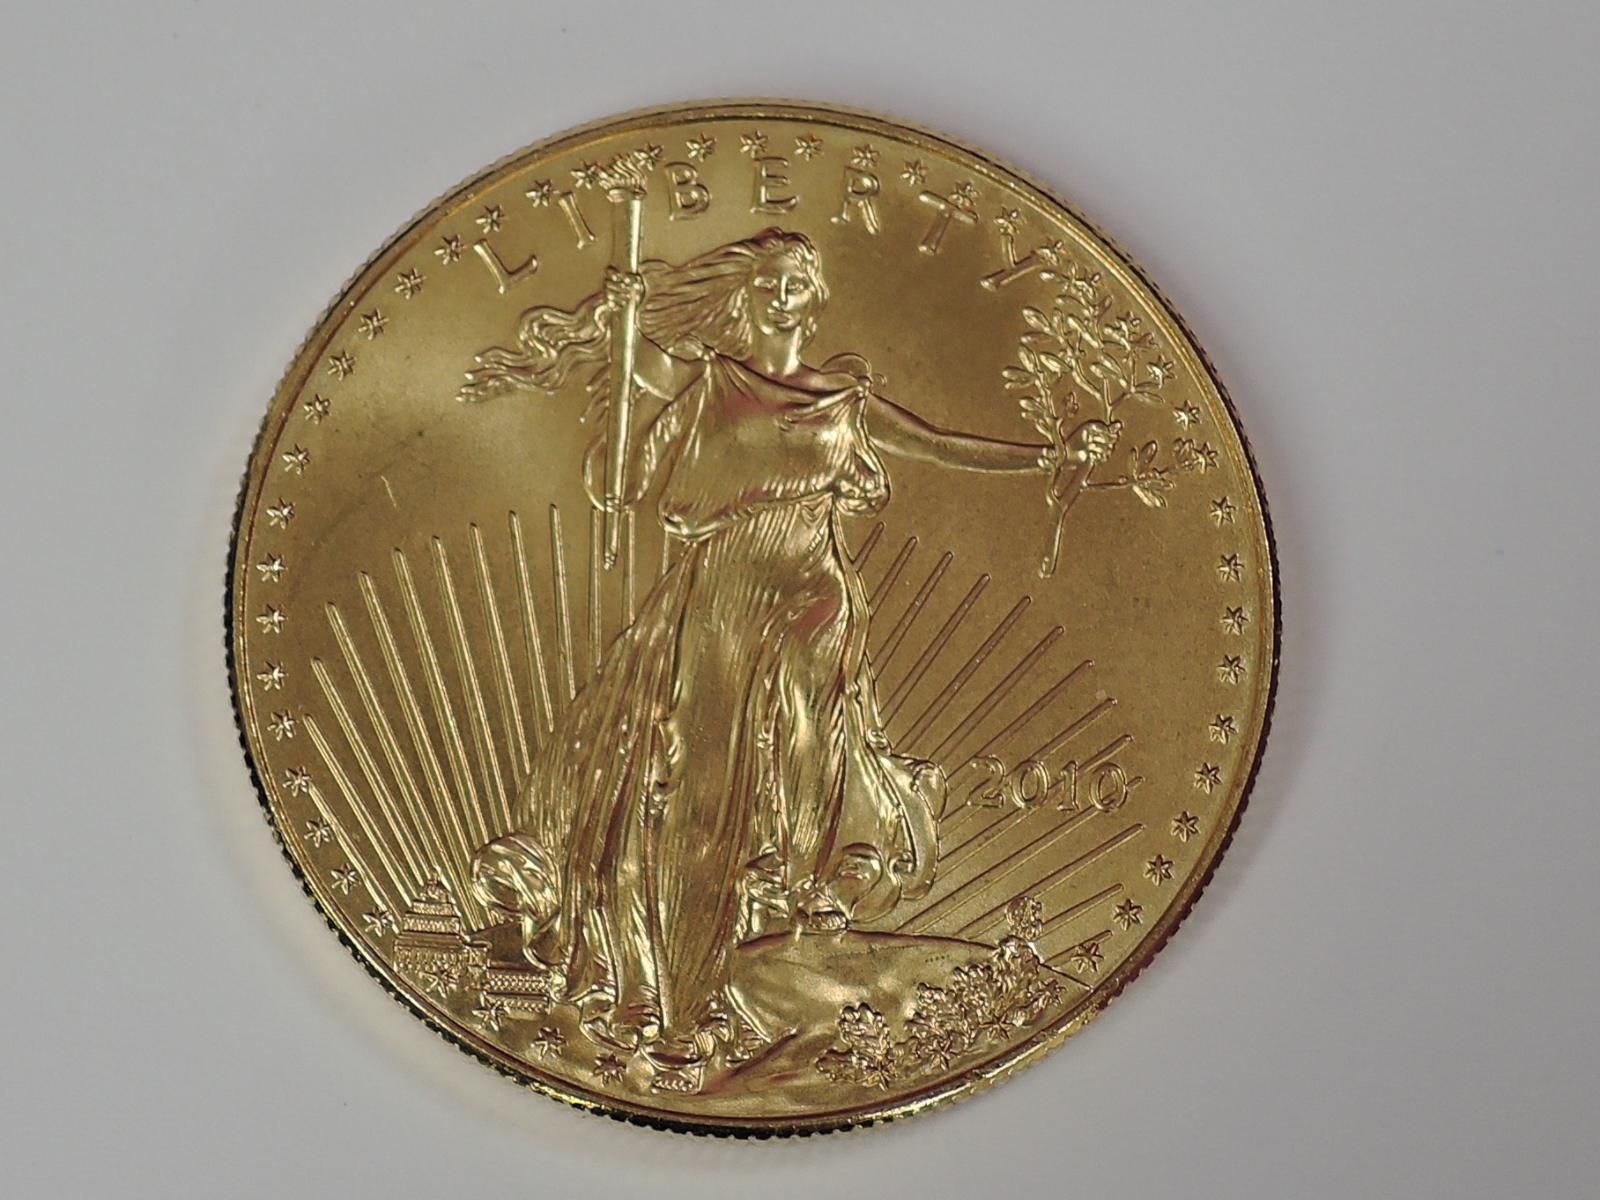 Lot 614 - A gold 1oz 2010 50 dollar U.S.A. coin, in plastic case